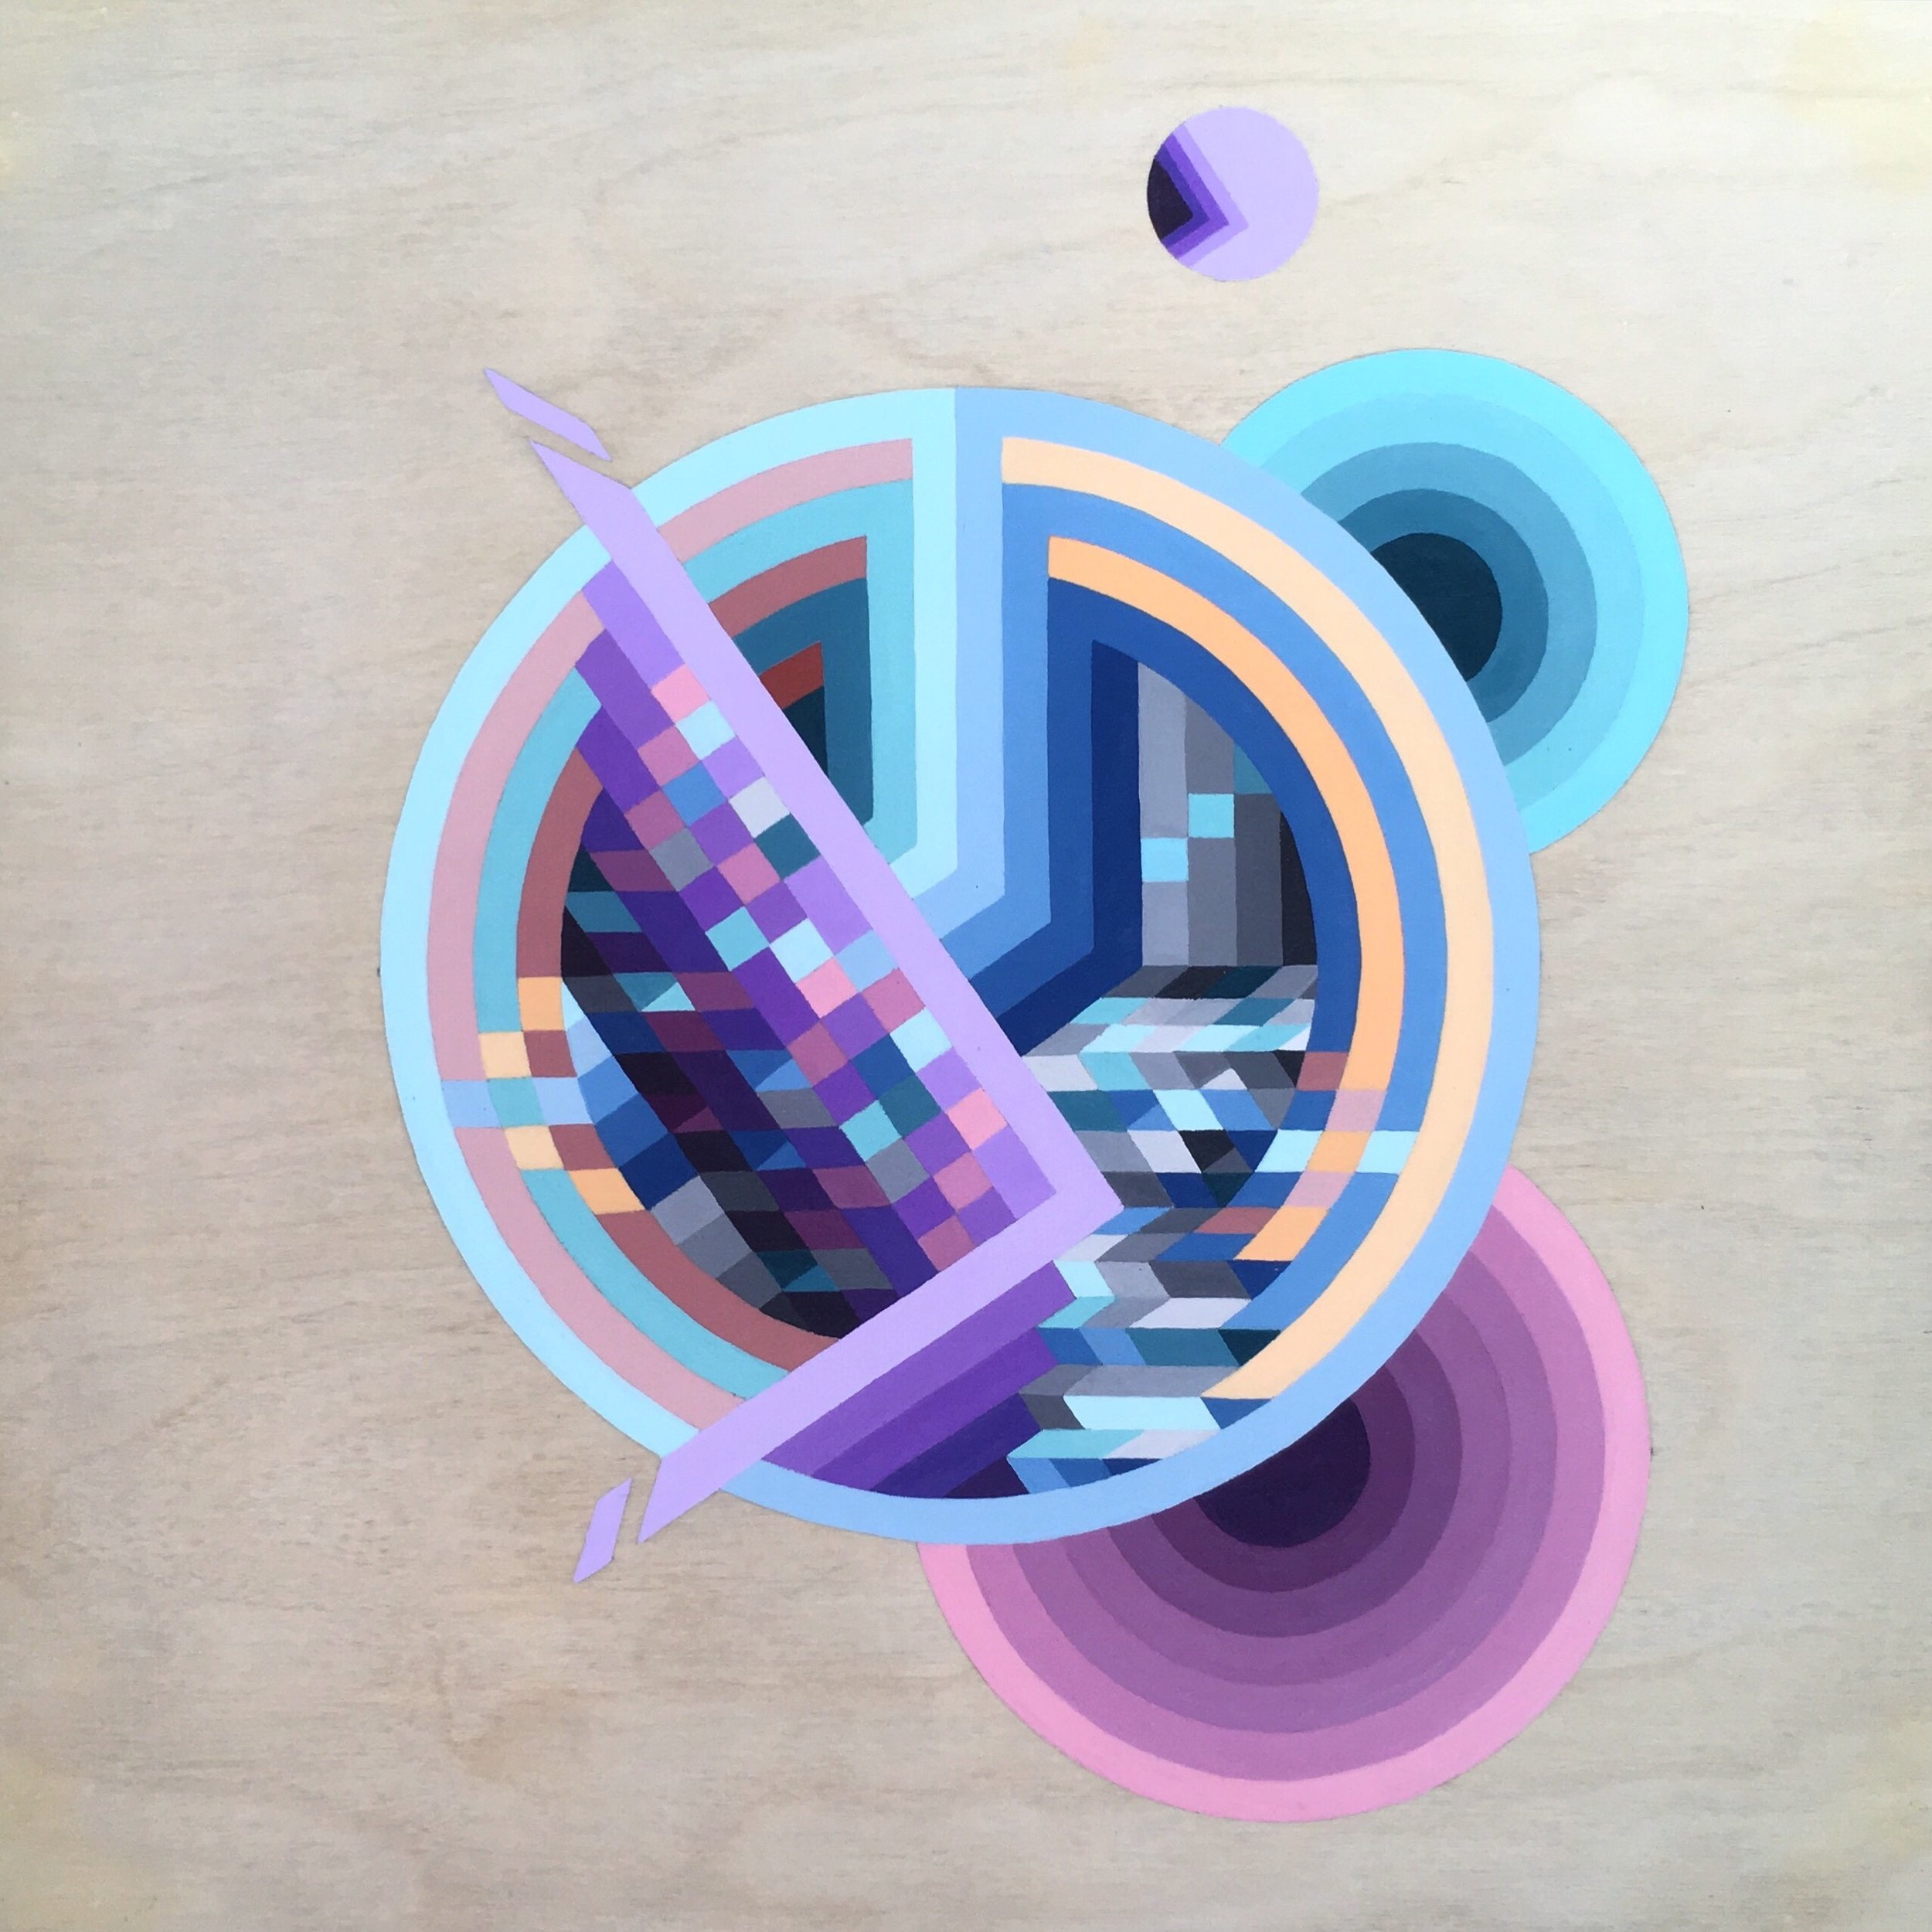 Rubix (2018)